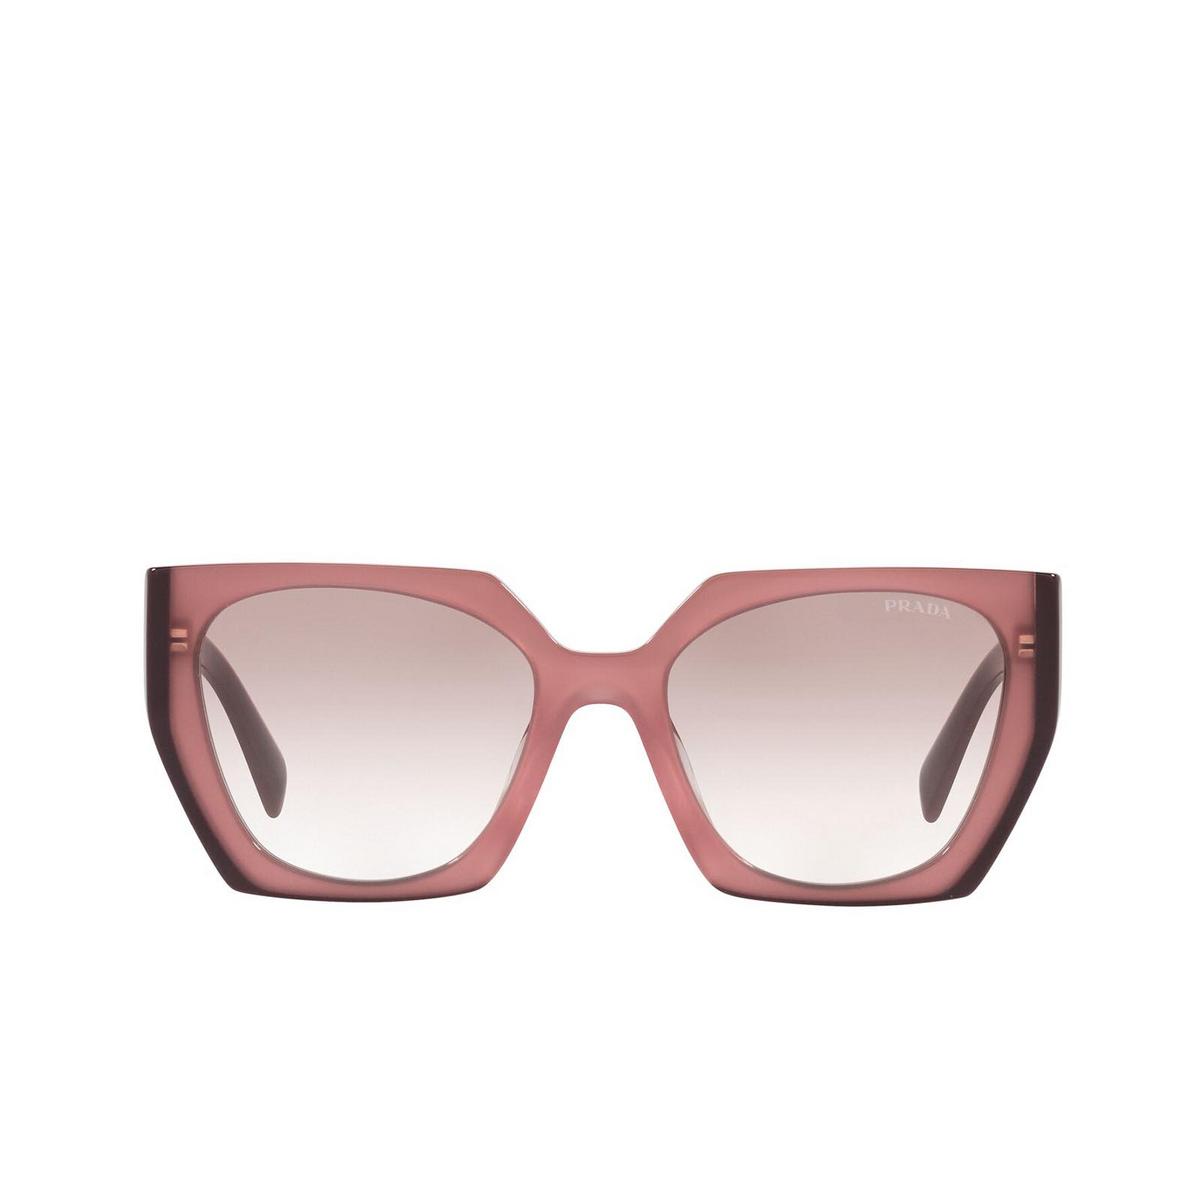 Prada® Square Sunglasses: PR 15WS color Opal Garnet 1221L0 - front view.